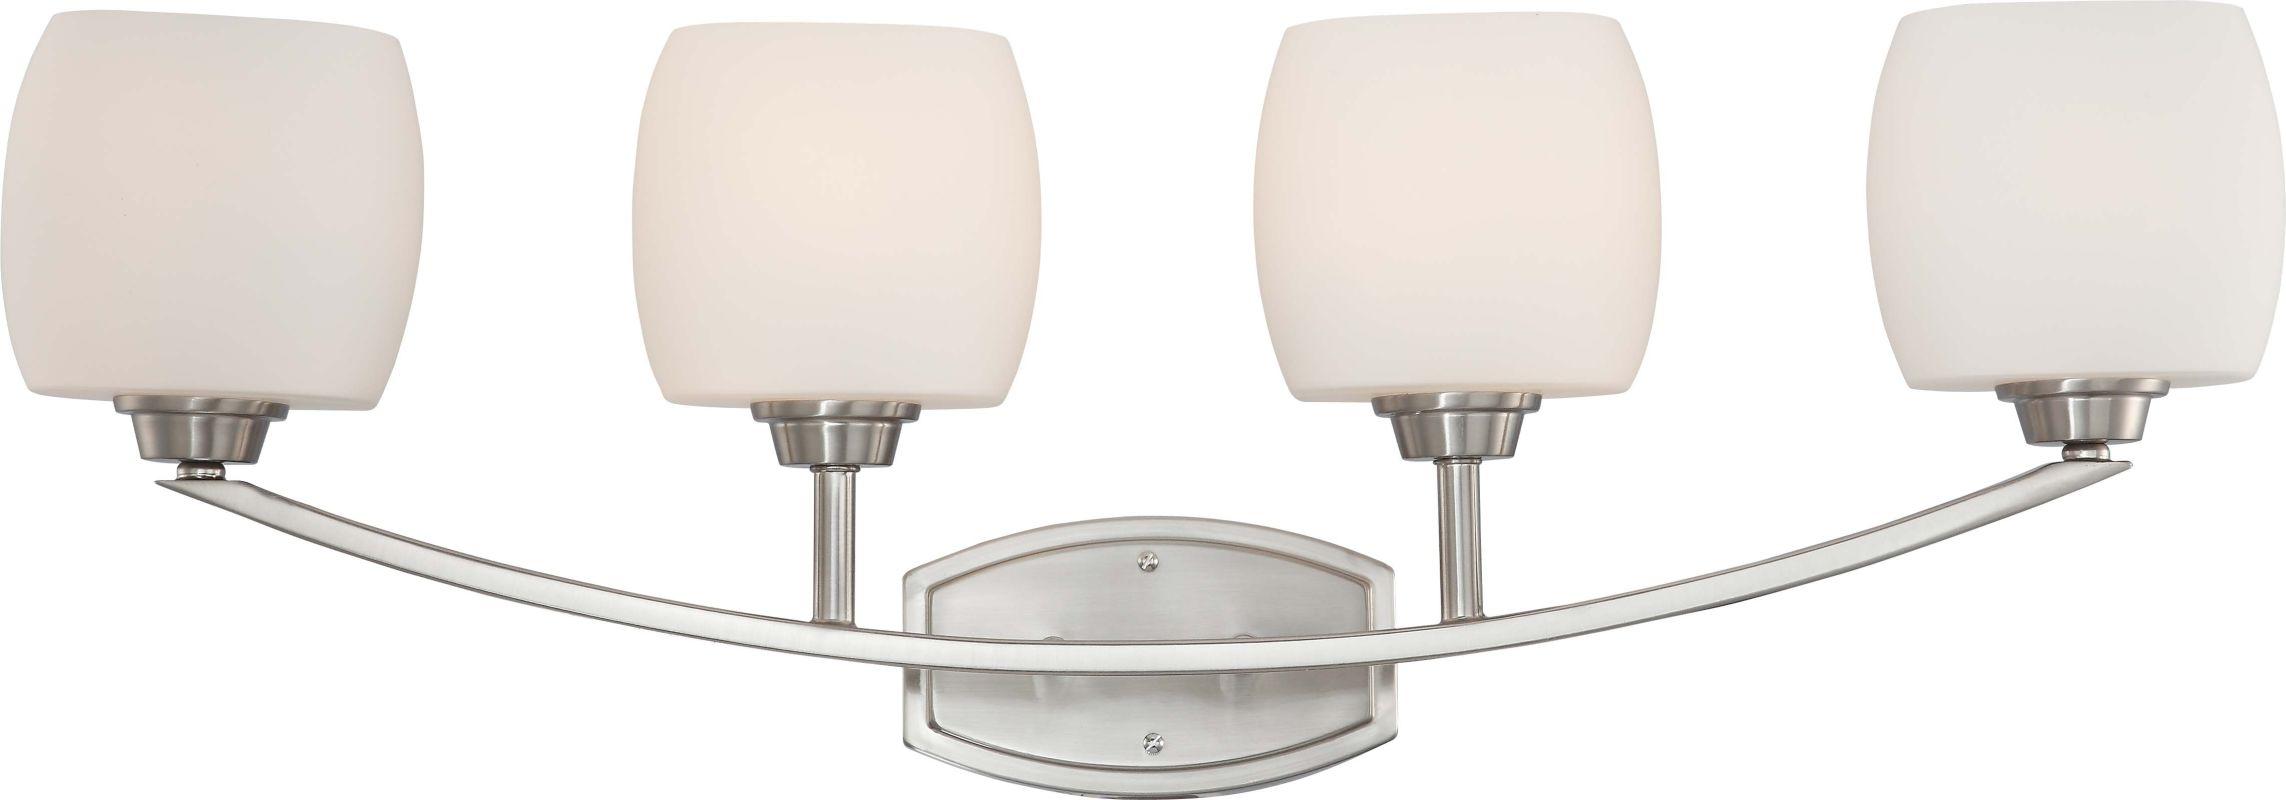 Shop Progress Lighting 4 Light Calven Brushed Nickel: 60/4184 In Brushed Nickel By Nuvo